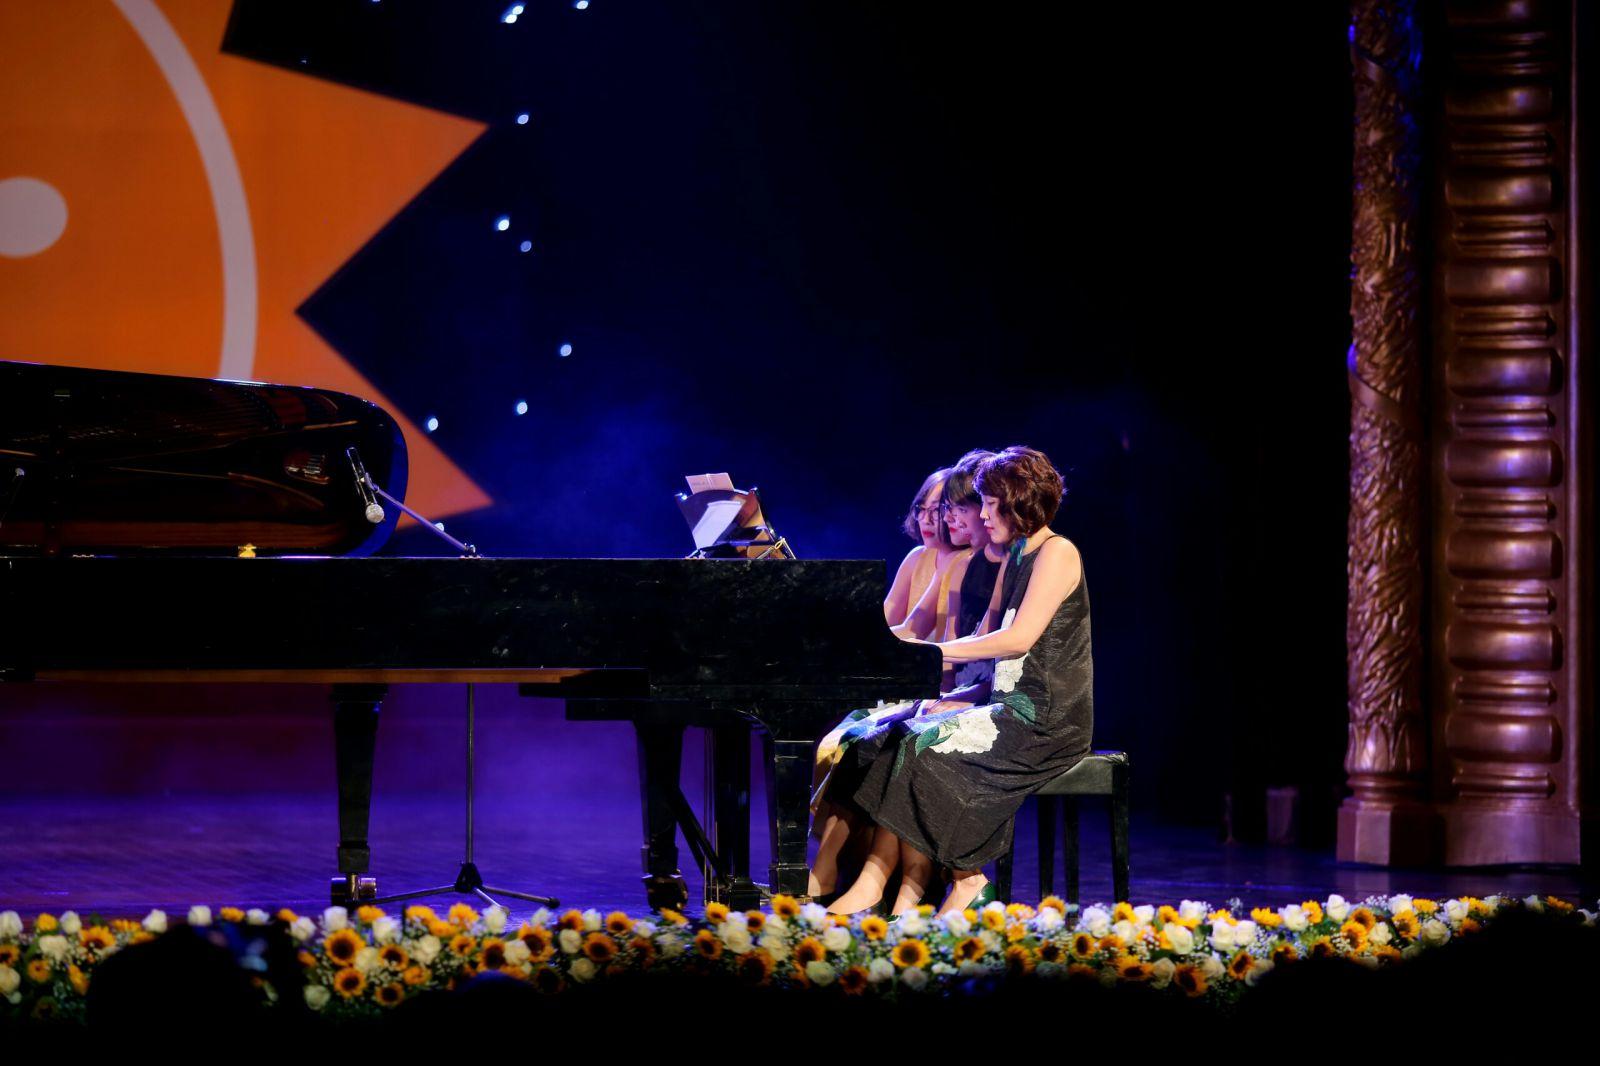 Gallop Manrche - Lagvinac 16 hands for 2 Pianos